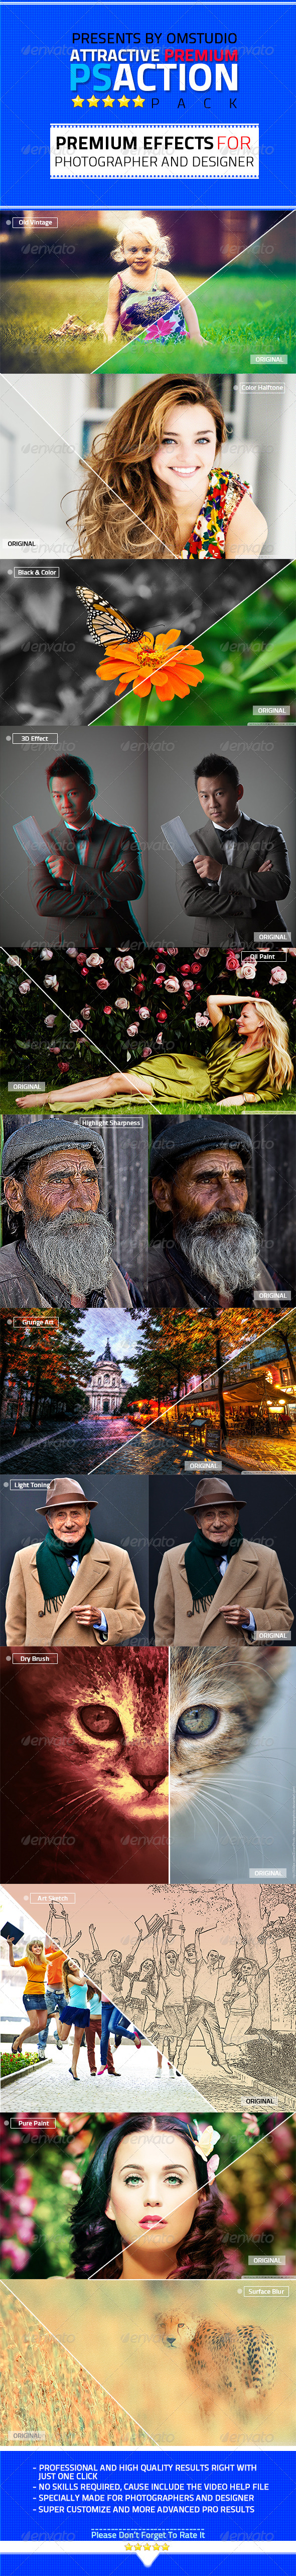 GraphicRiver Attractive Premium Photoshop Action Pack 5507069